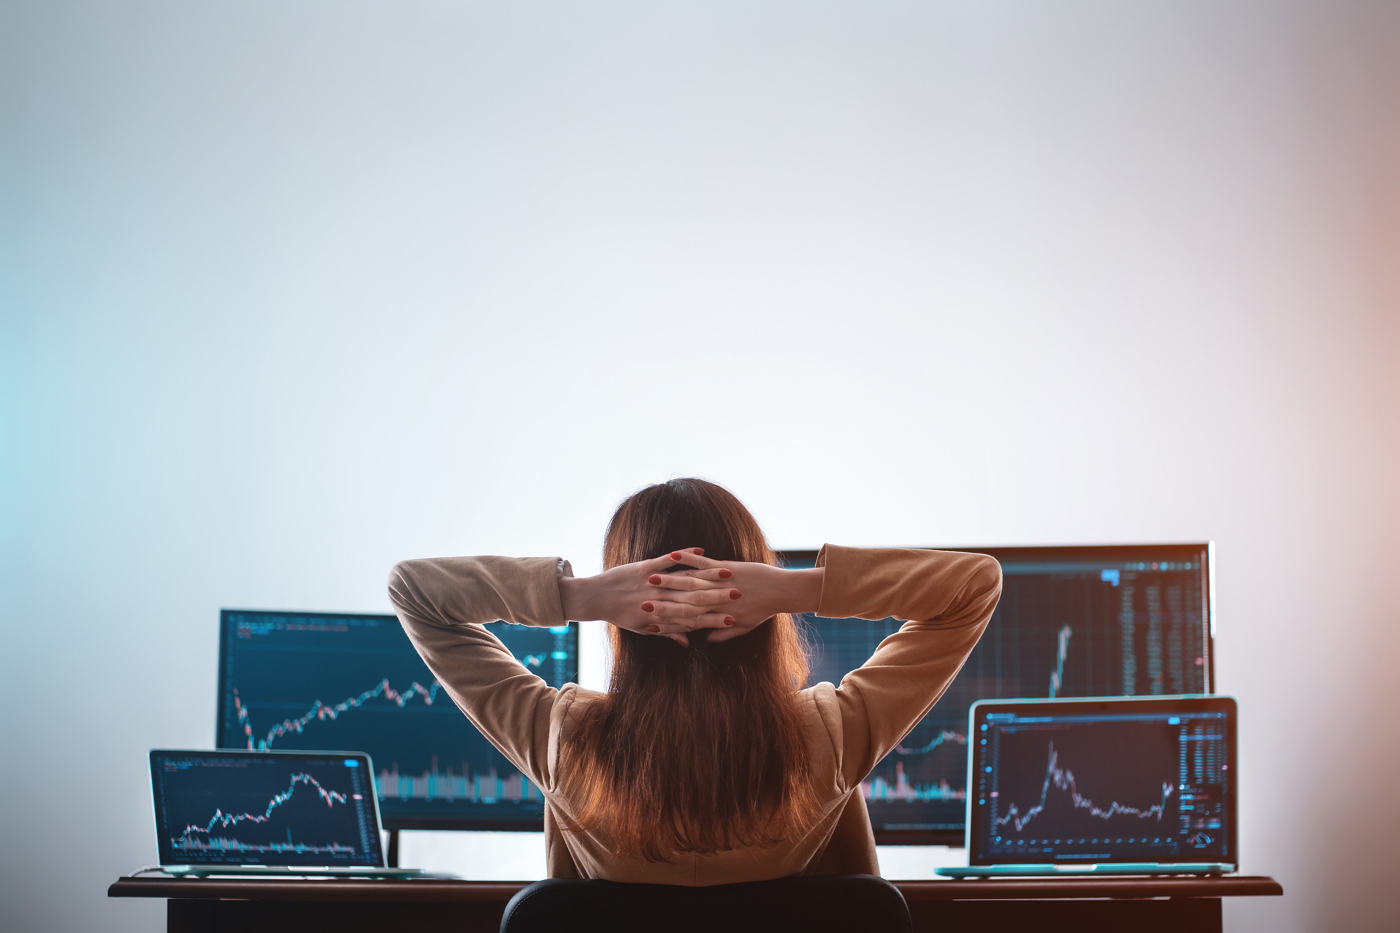 Trader watching stock market price action